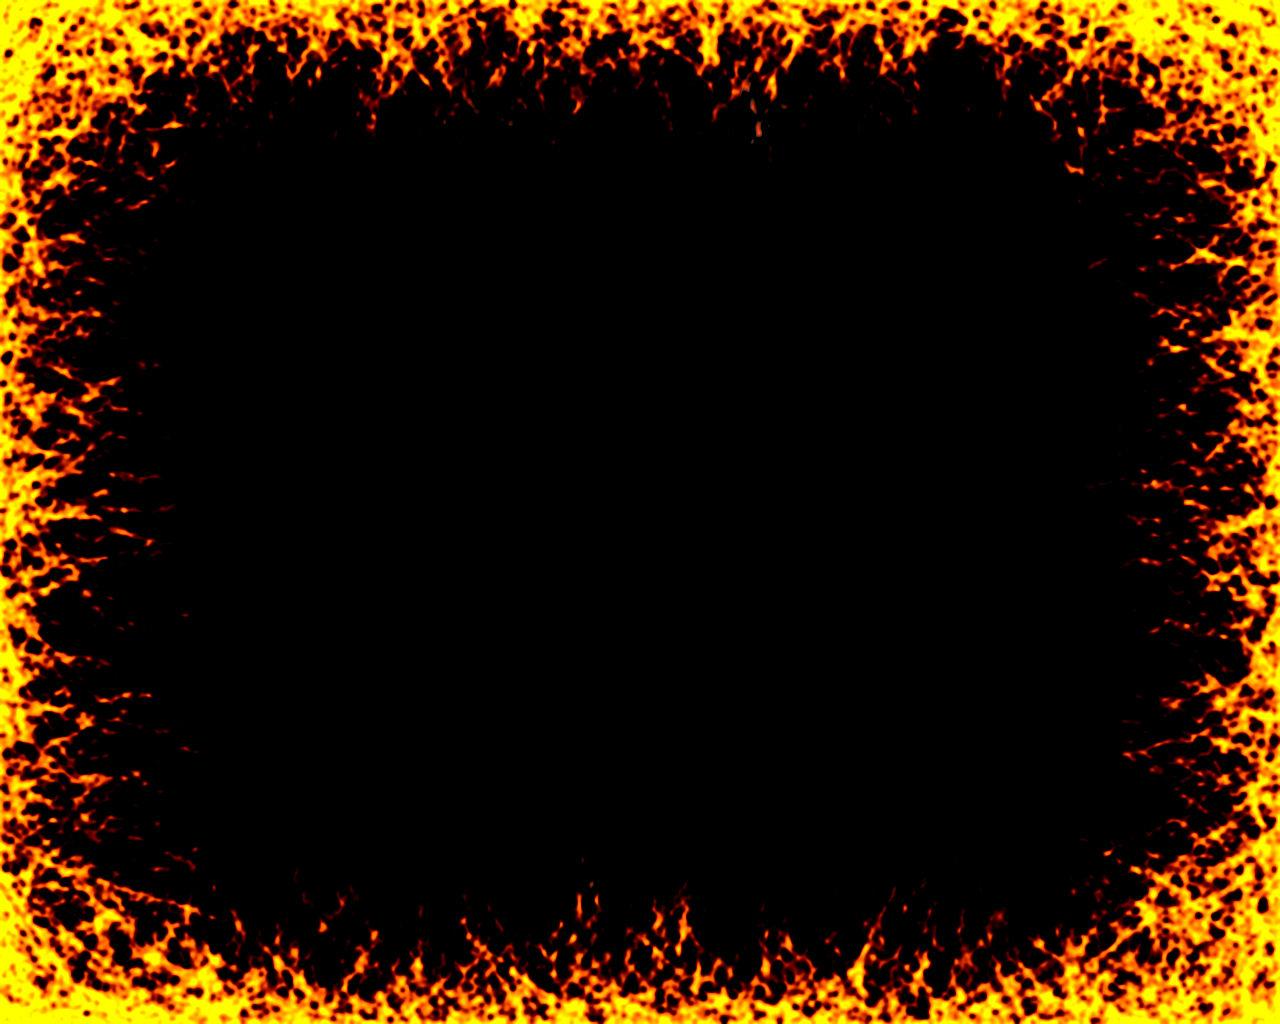 Image - FireBorder.jpg